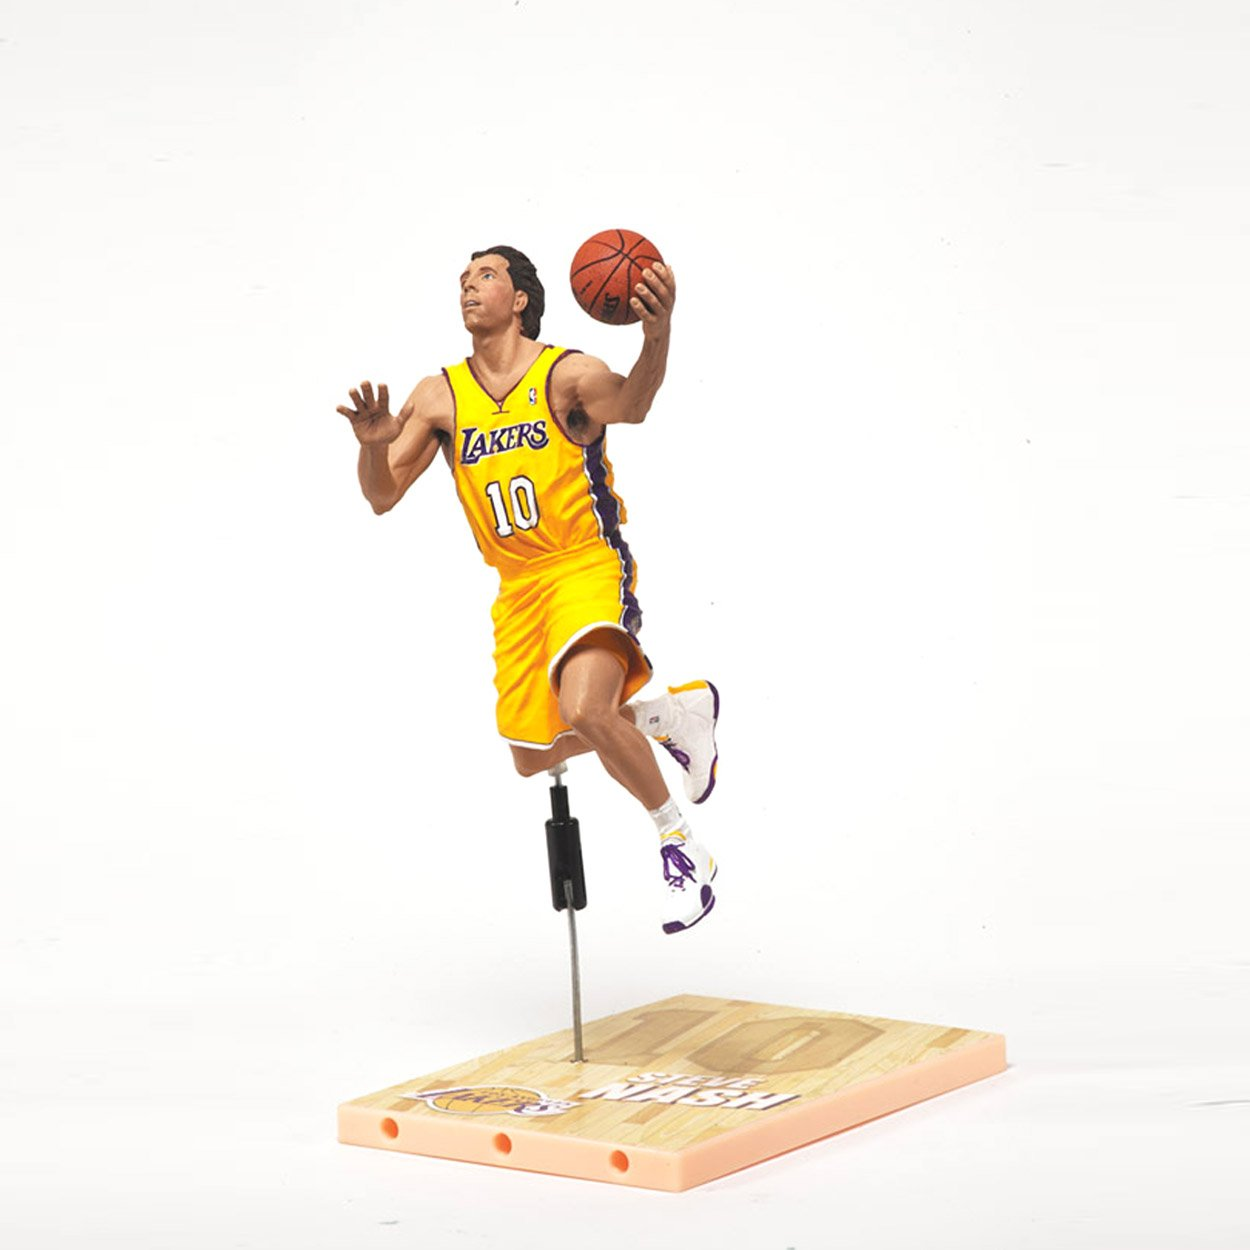 McFarlane NBA Figur Serie XXII (Steve Nash)